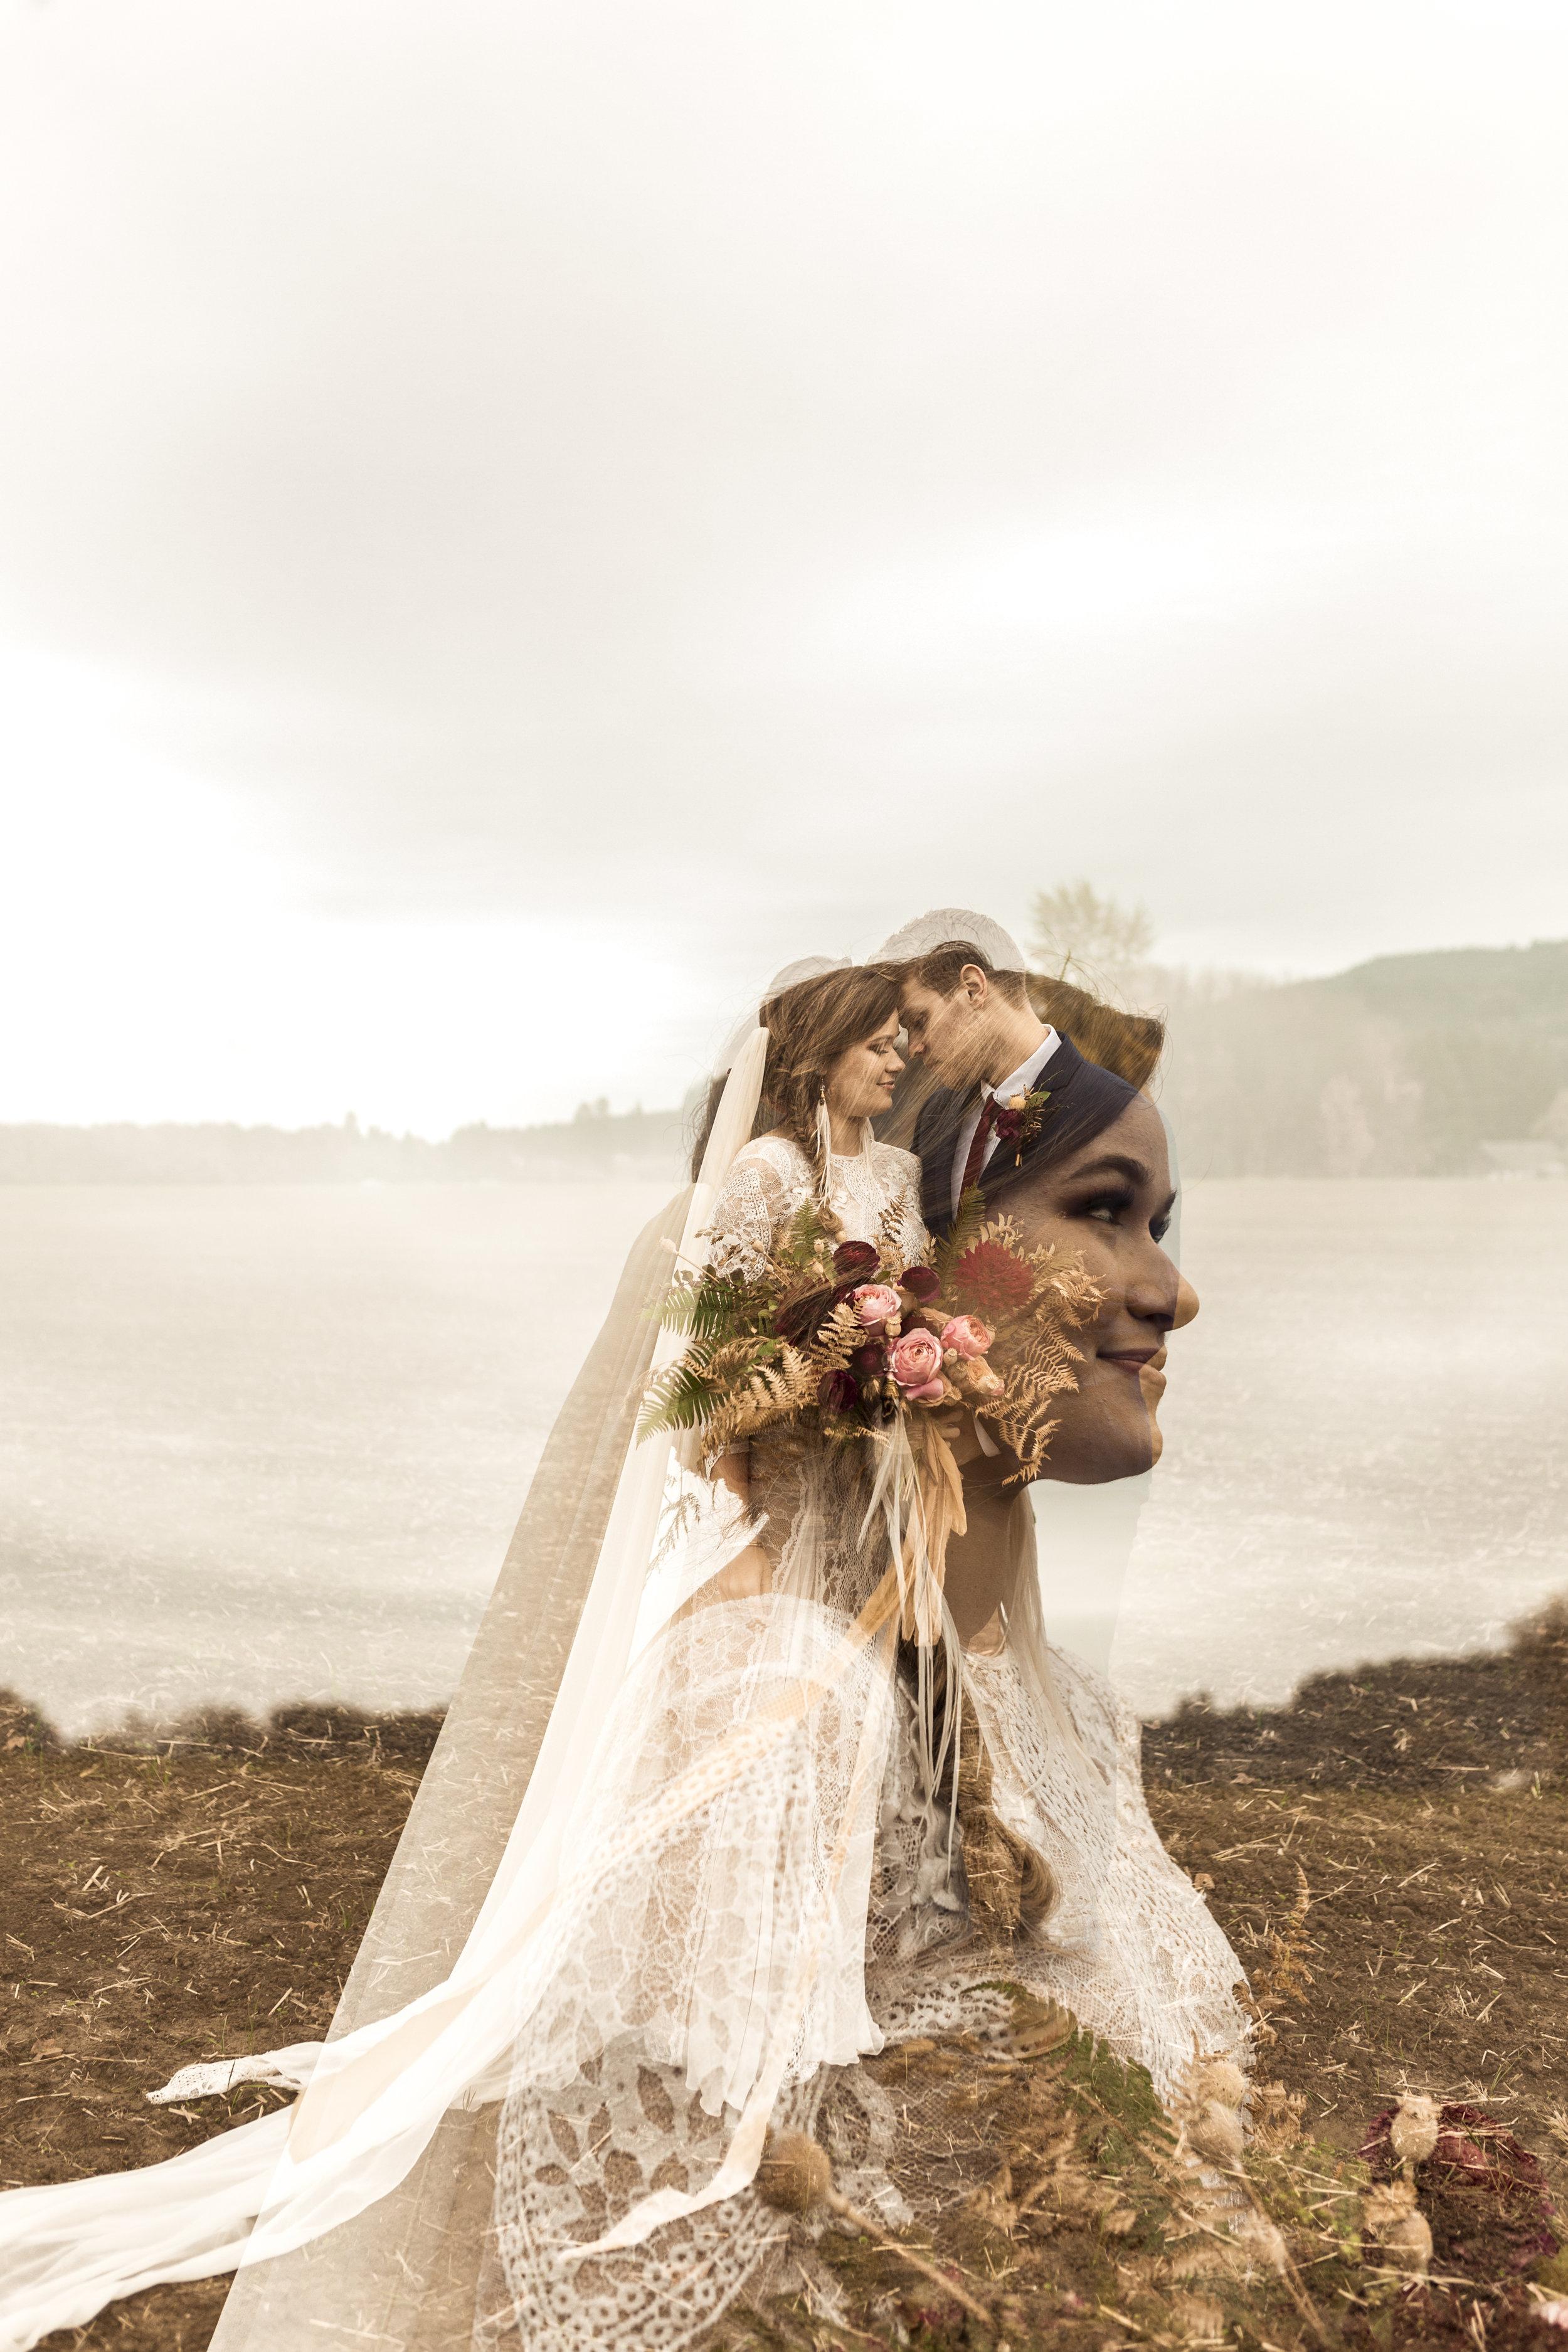 PNW Elopement | Forest Grove, Oregon | Bri Bergman Photography 029.JPG